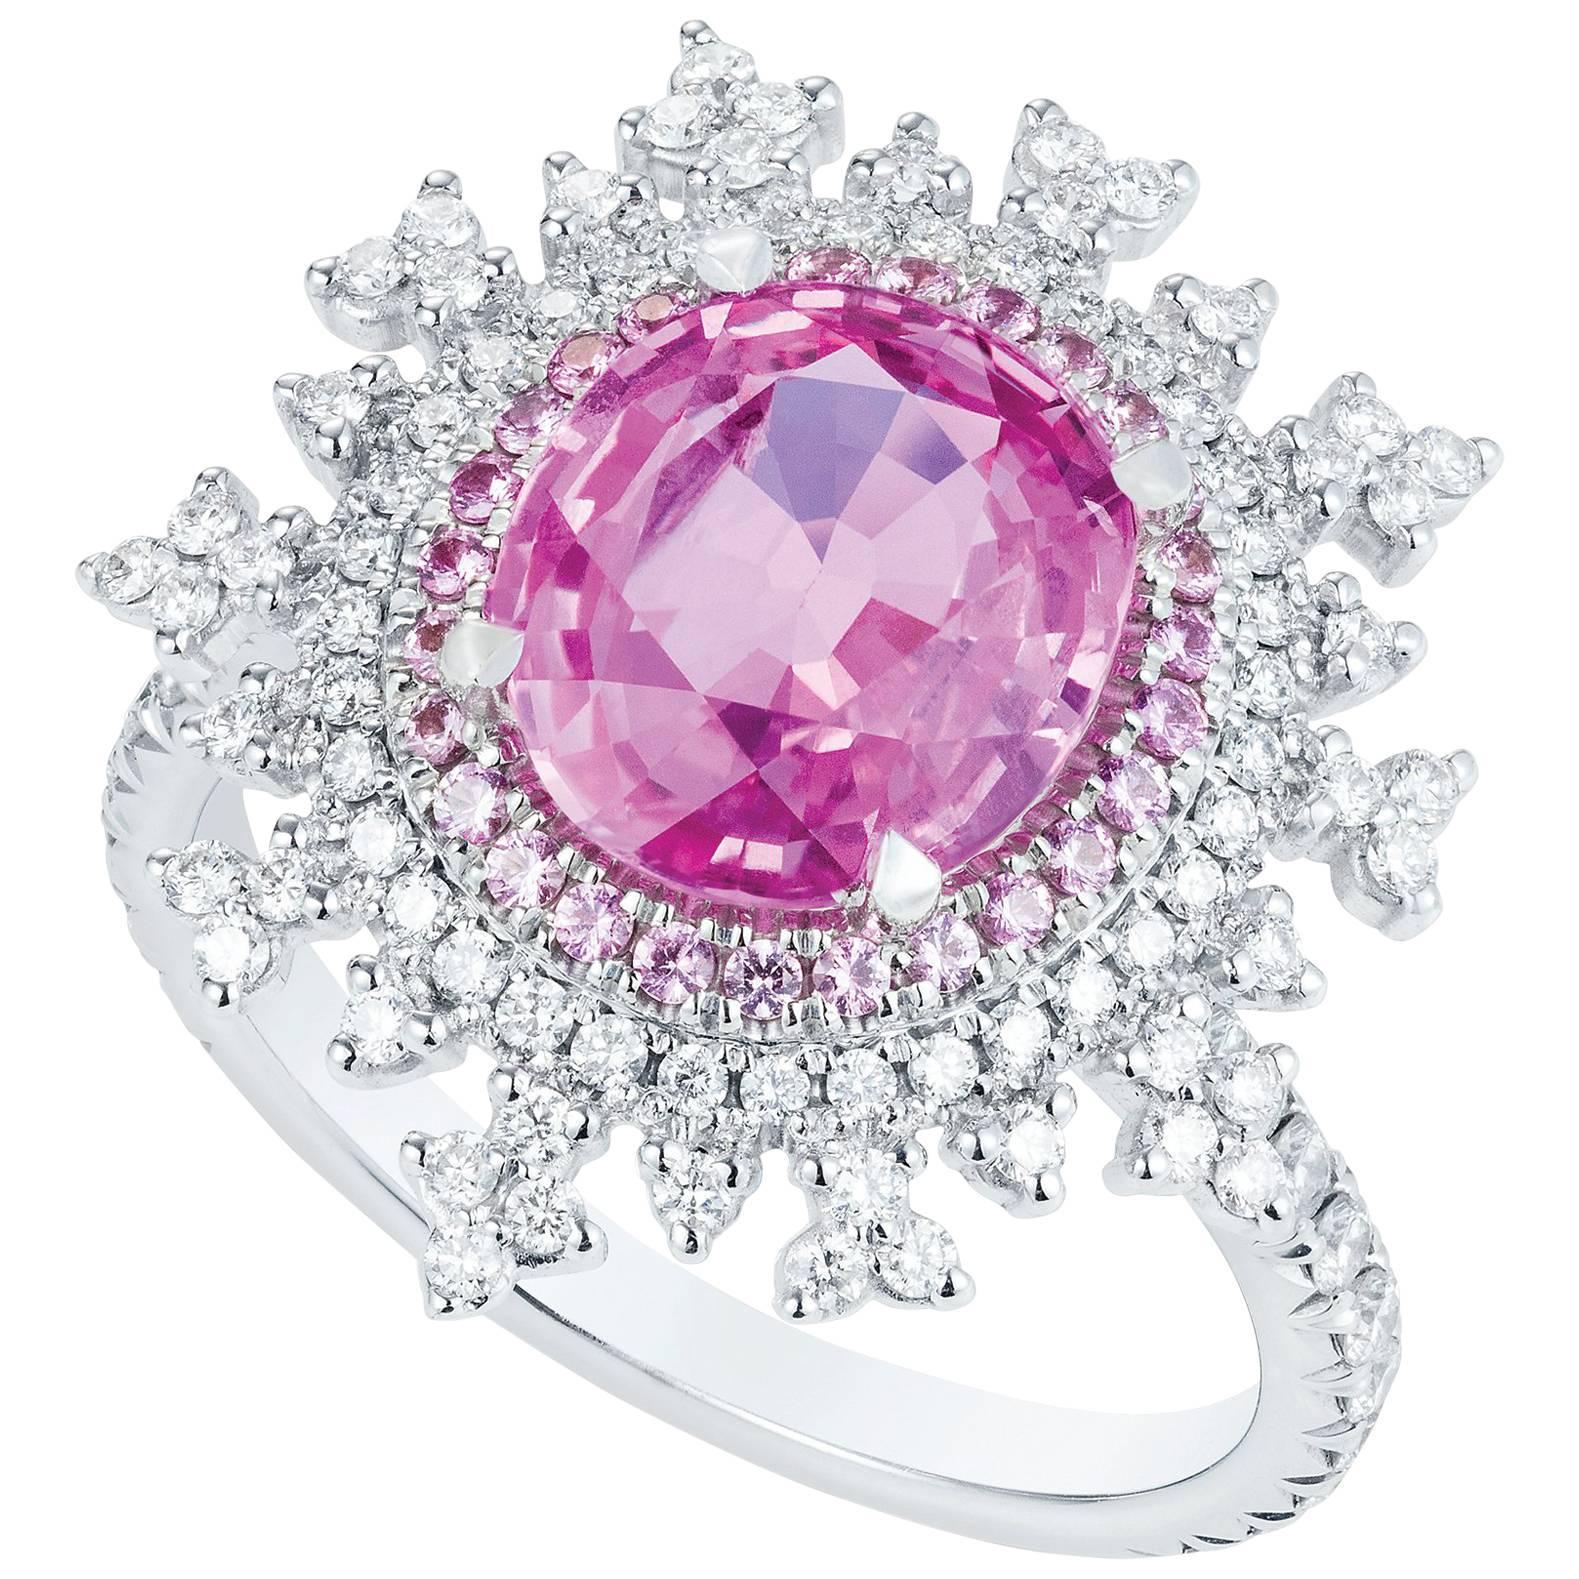 Nadine Aysoy 18Karat White Gold, Pink Sapphire and White Diamond ...